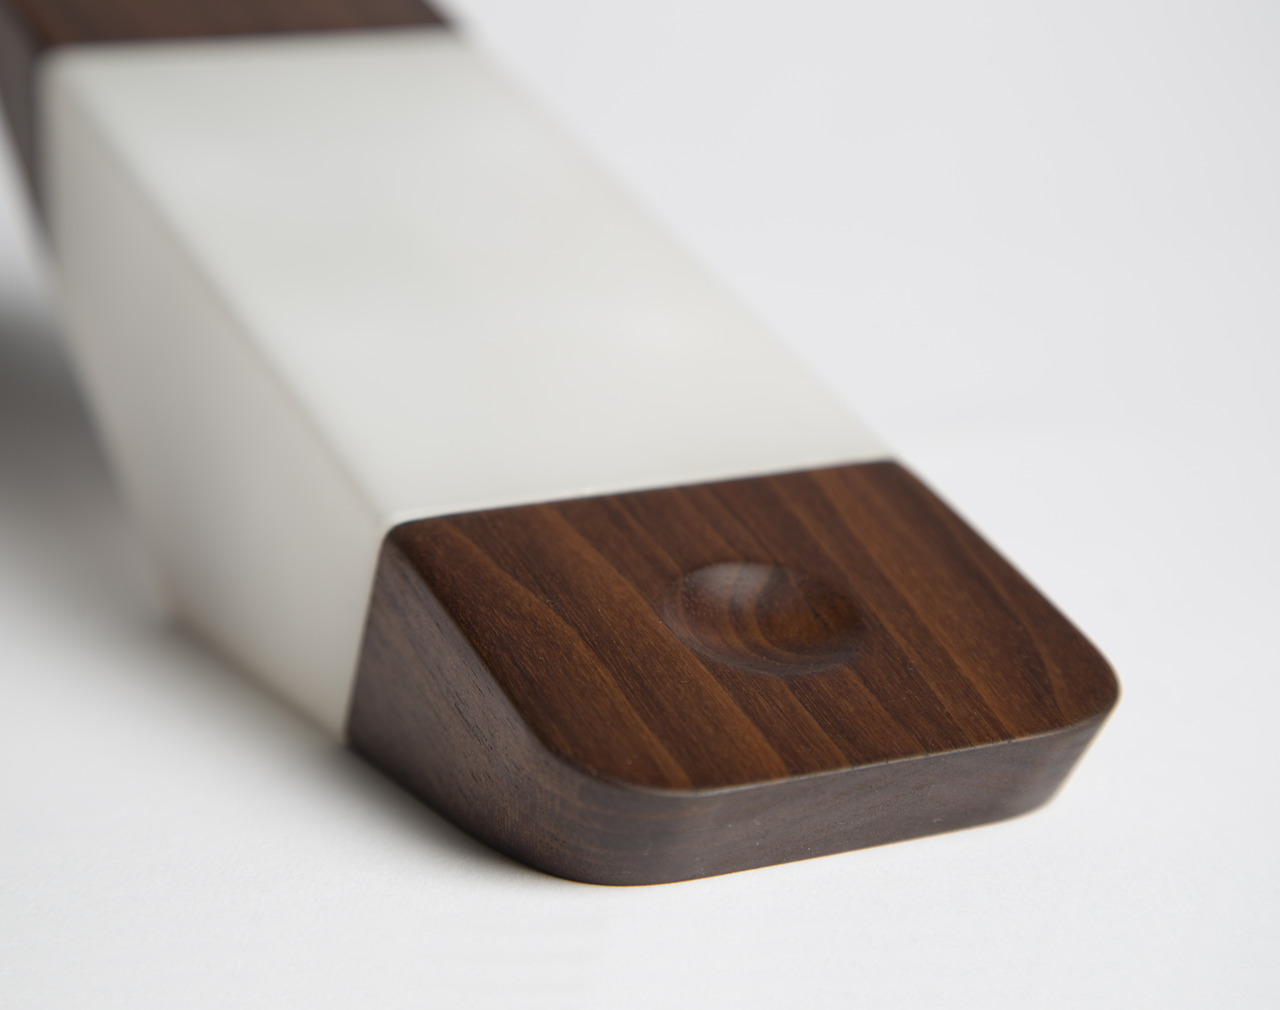 awesome-design-ideas-ADi-Prism-nightlight-Nicholas-Baker-4